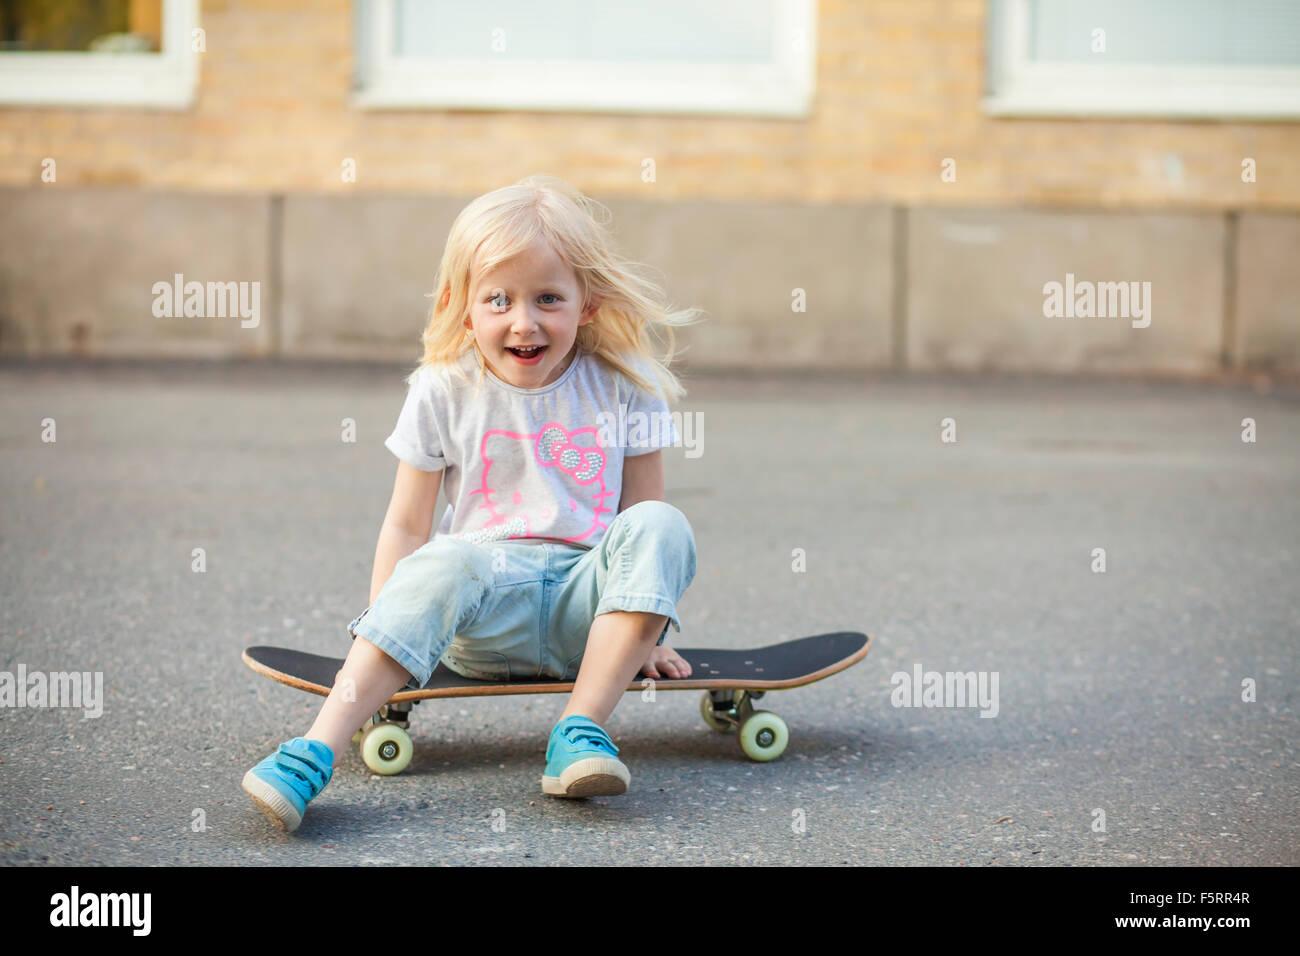 La Svezia, Vastergotland, Lerum, ragazza (6-7) seduto su skateboard Immagini Stock